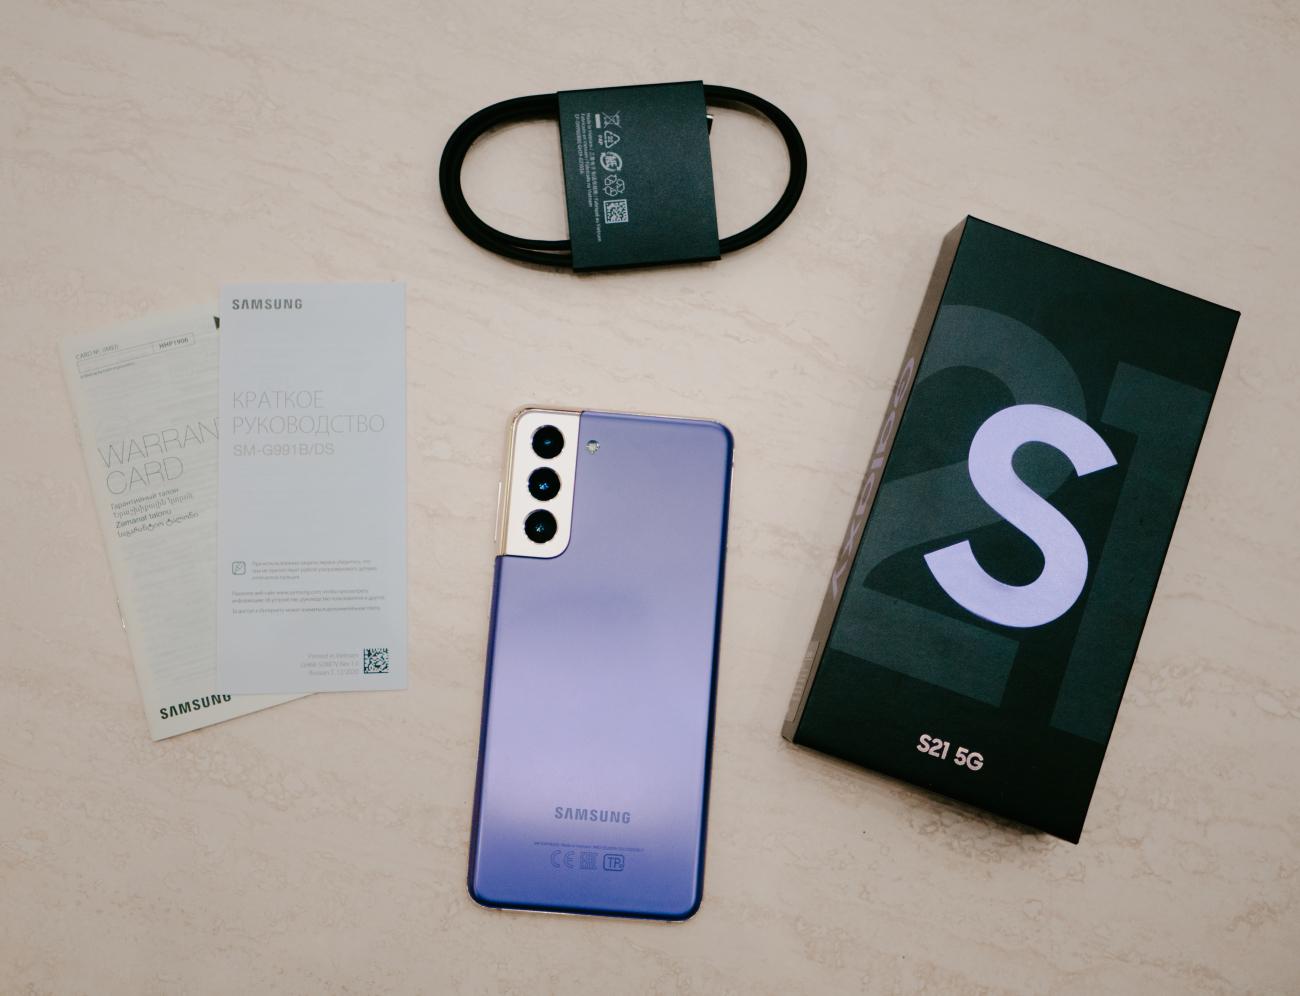 Samsung Galaxy S21 5G 8 128Gb Phantom Grey